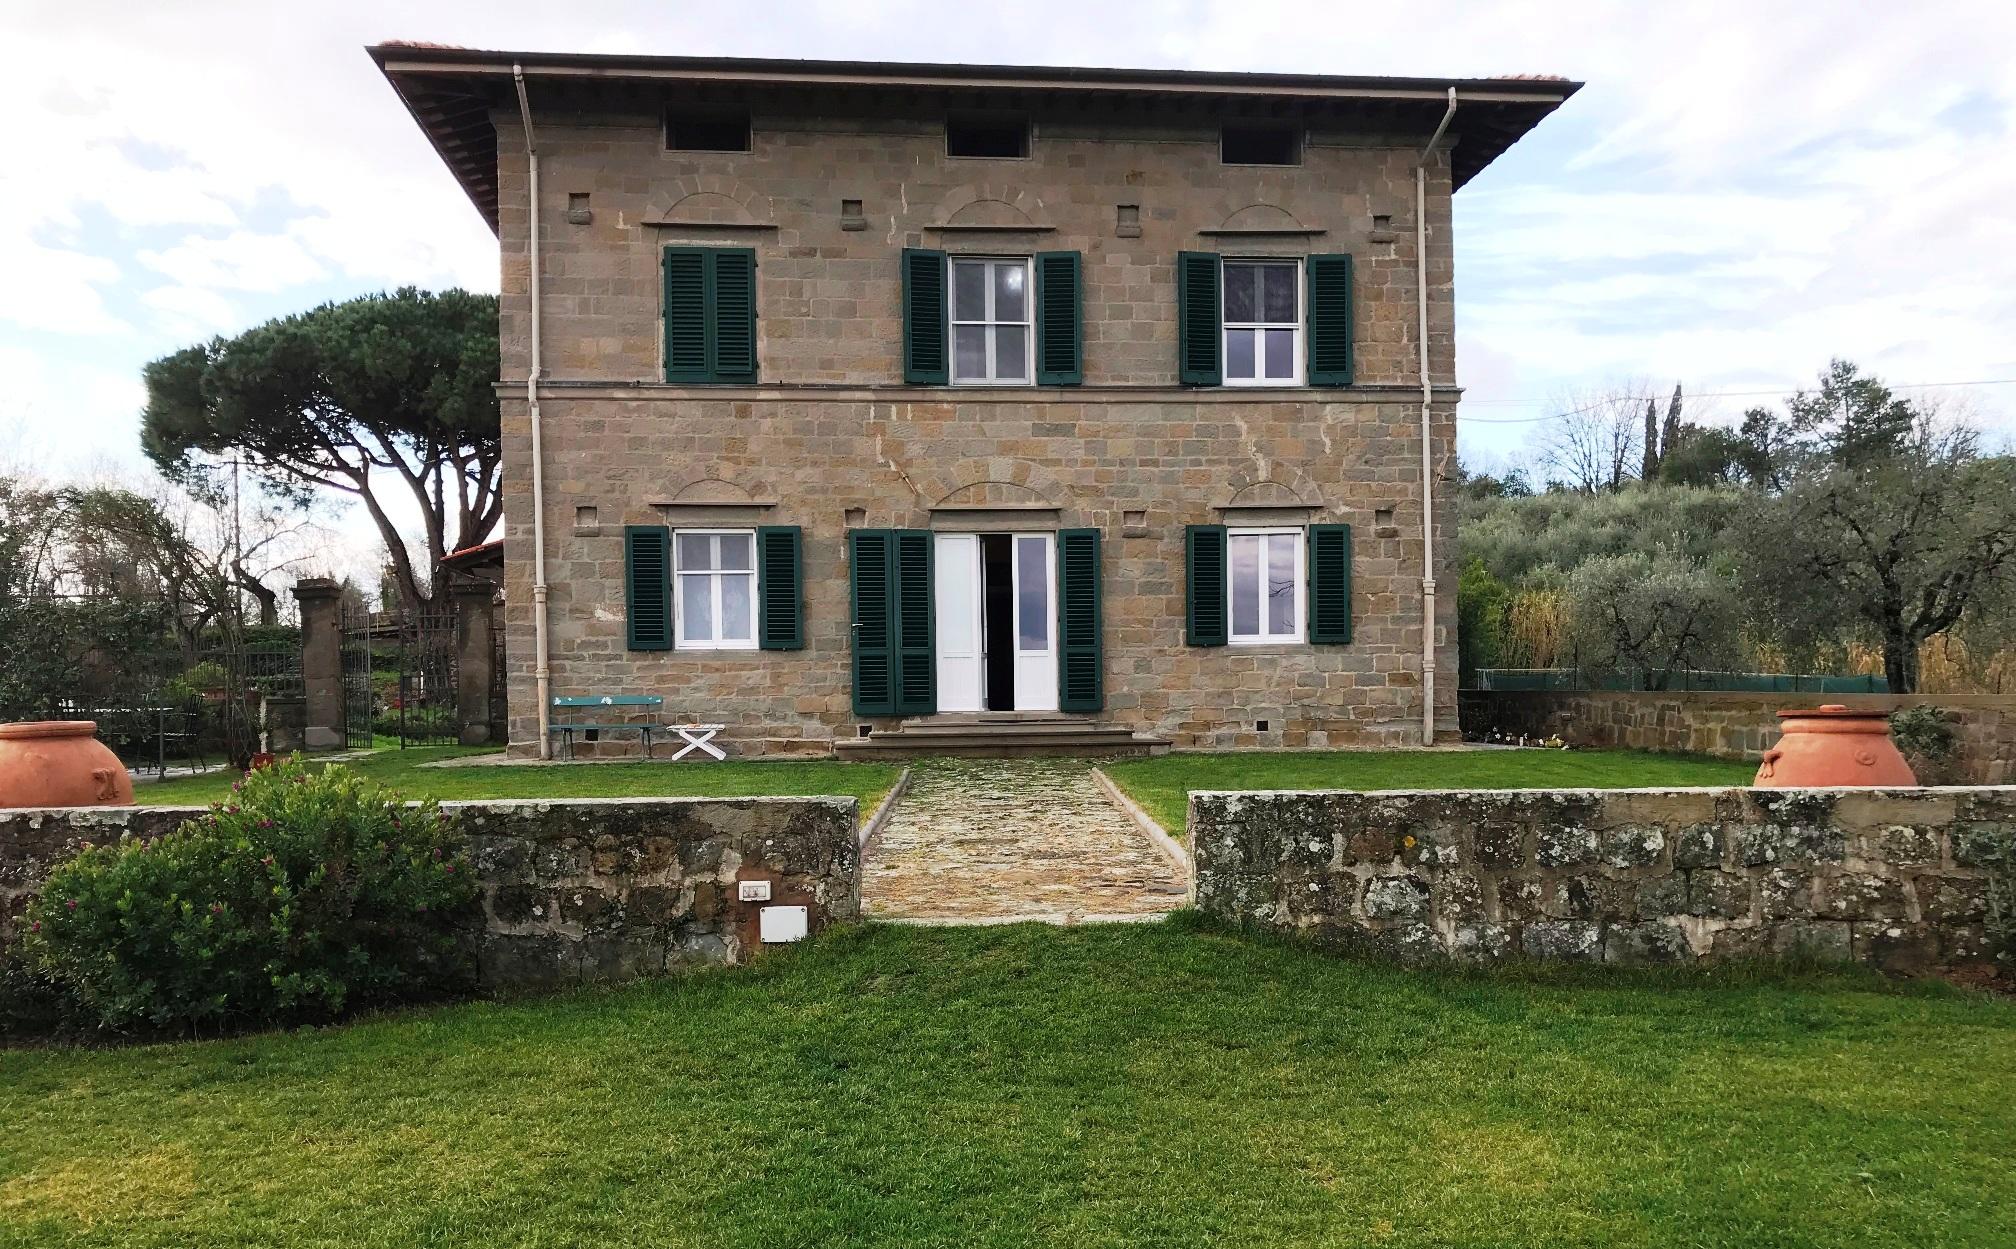 Villa Colombo Lastra a Signa Firenze